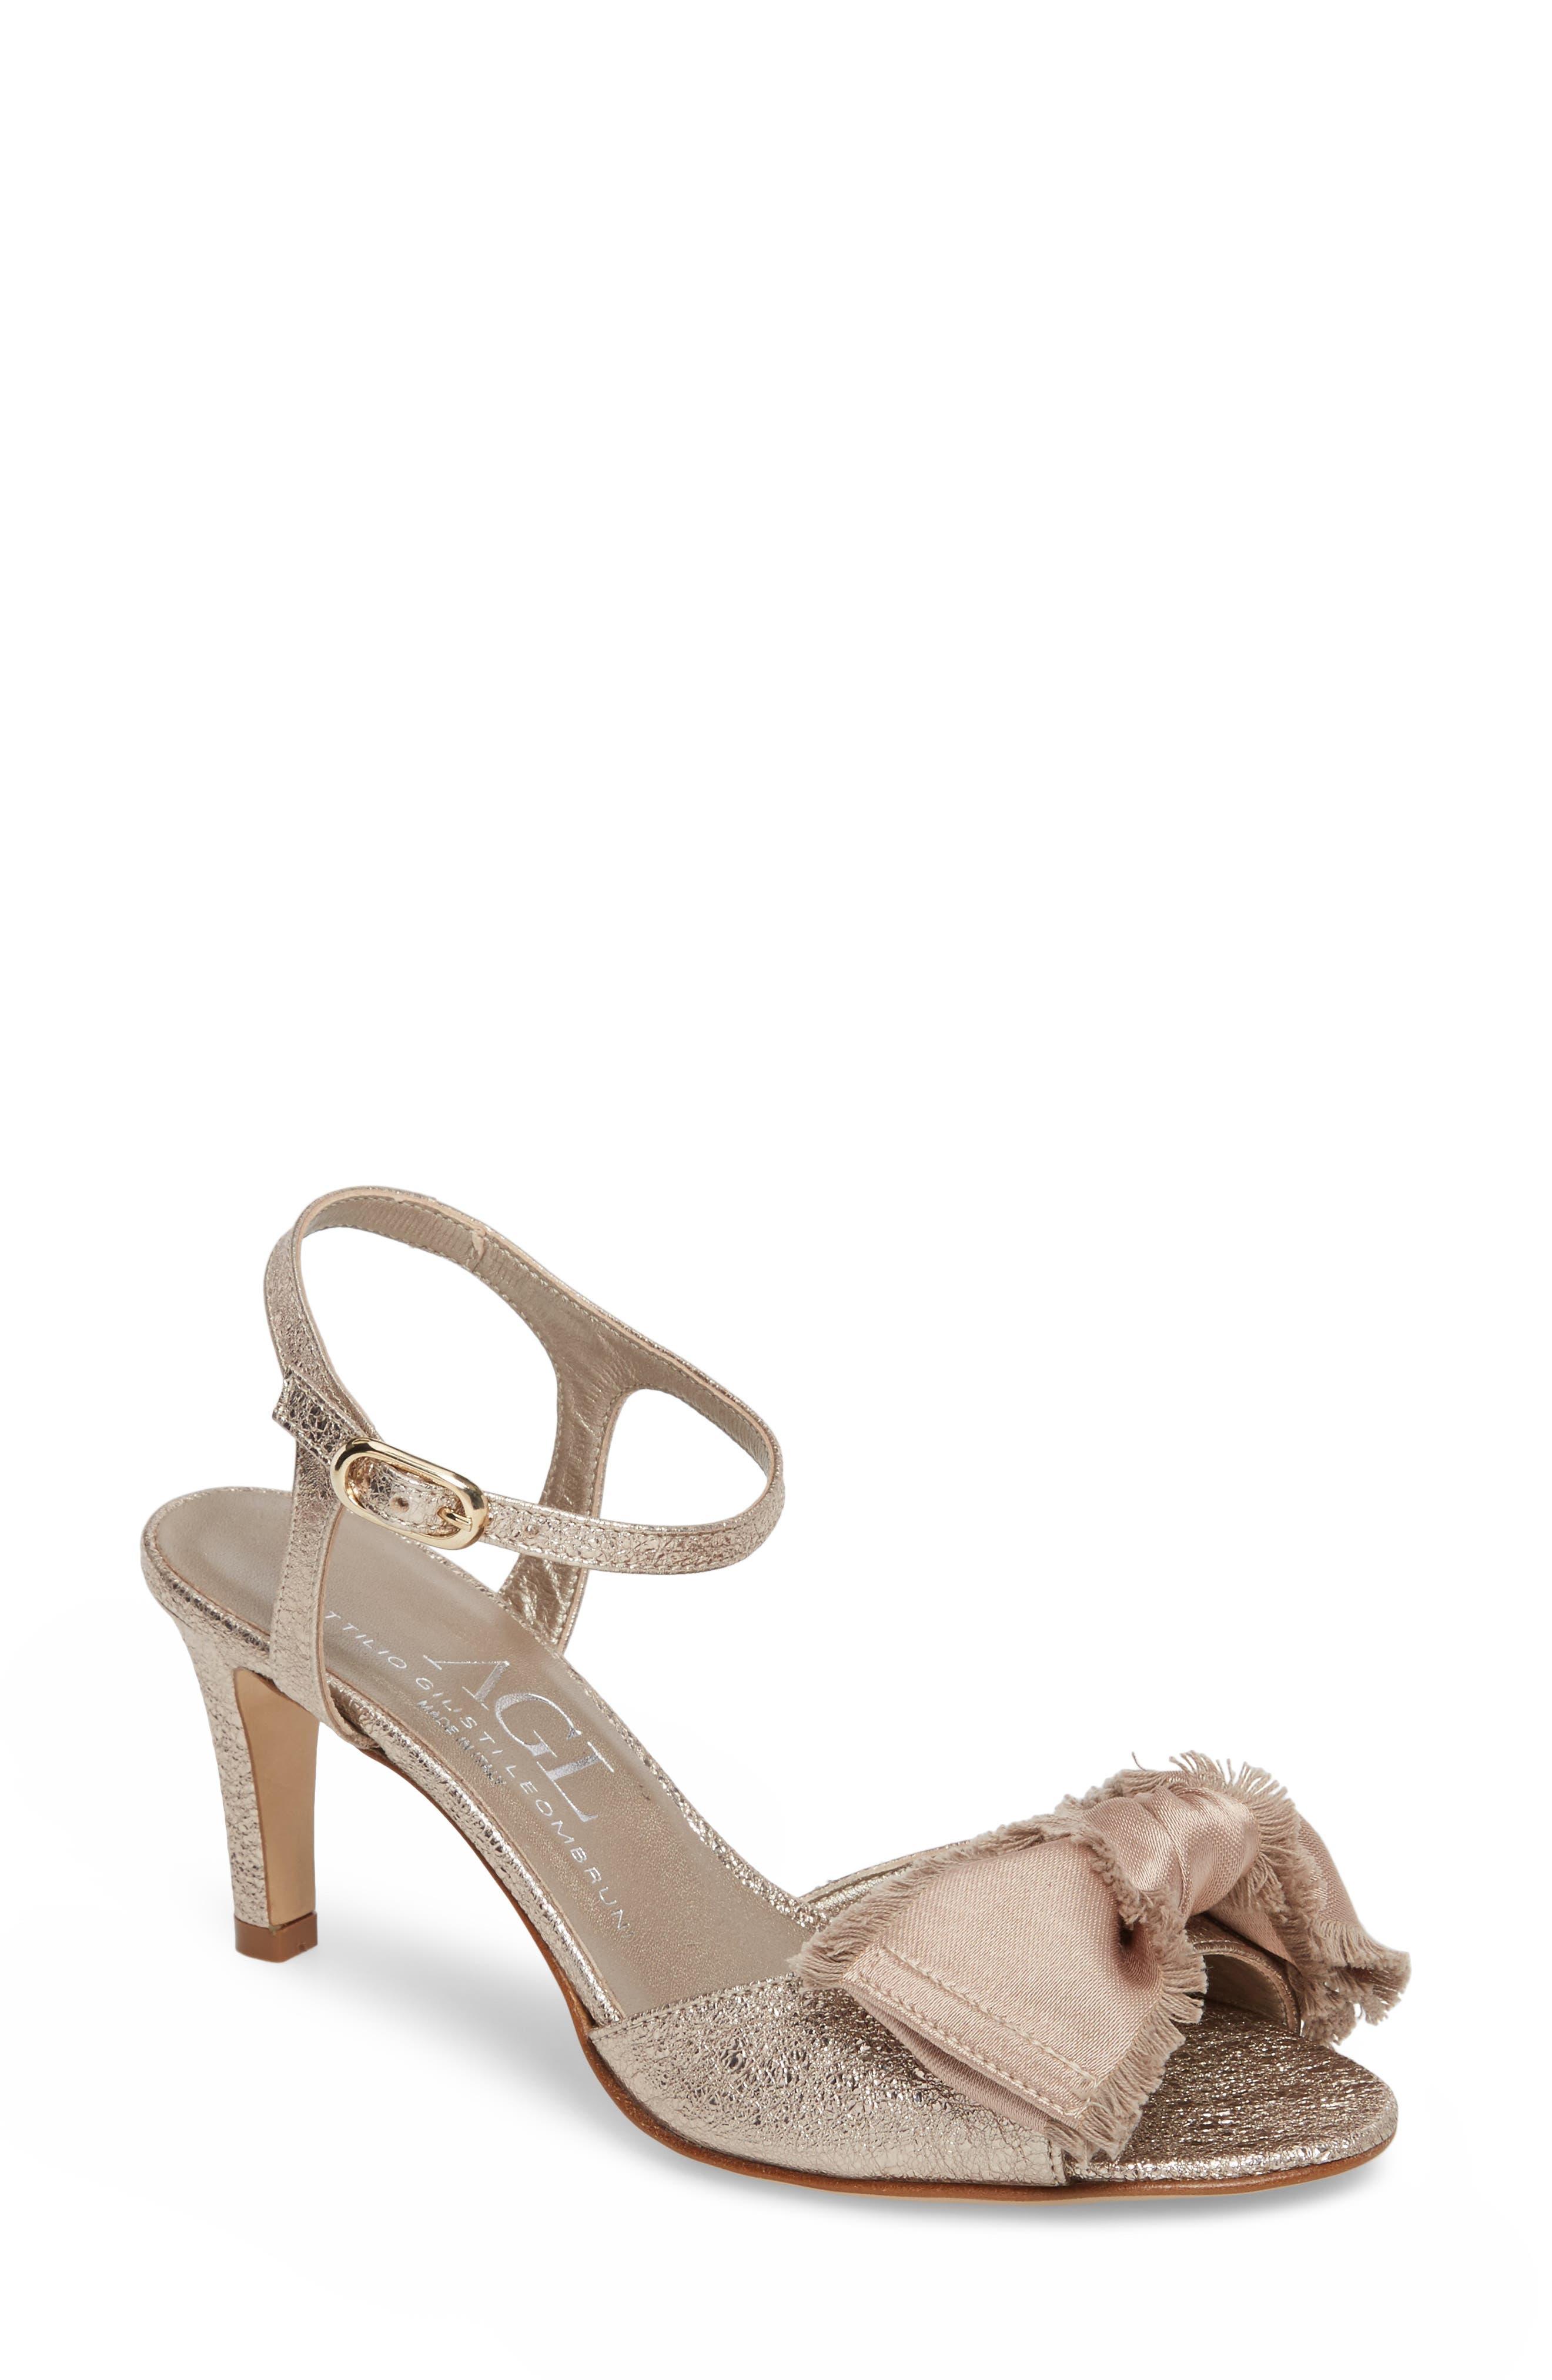 Main Image - AGL Glam Sandal (Women)